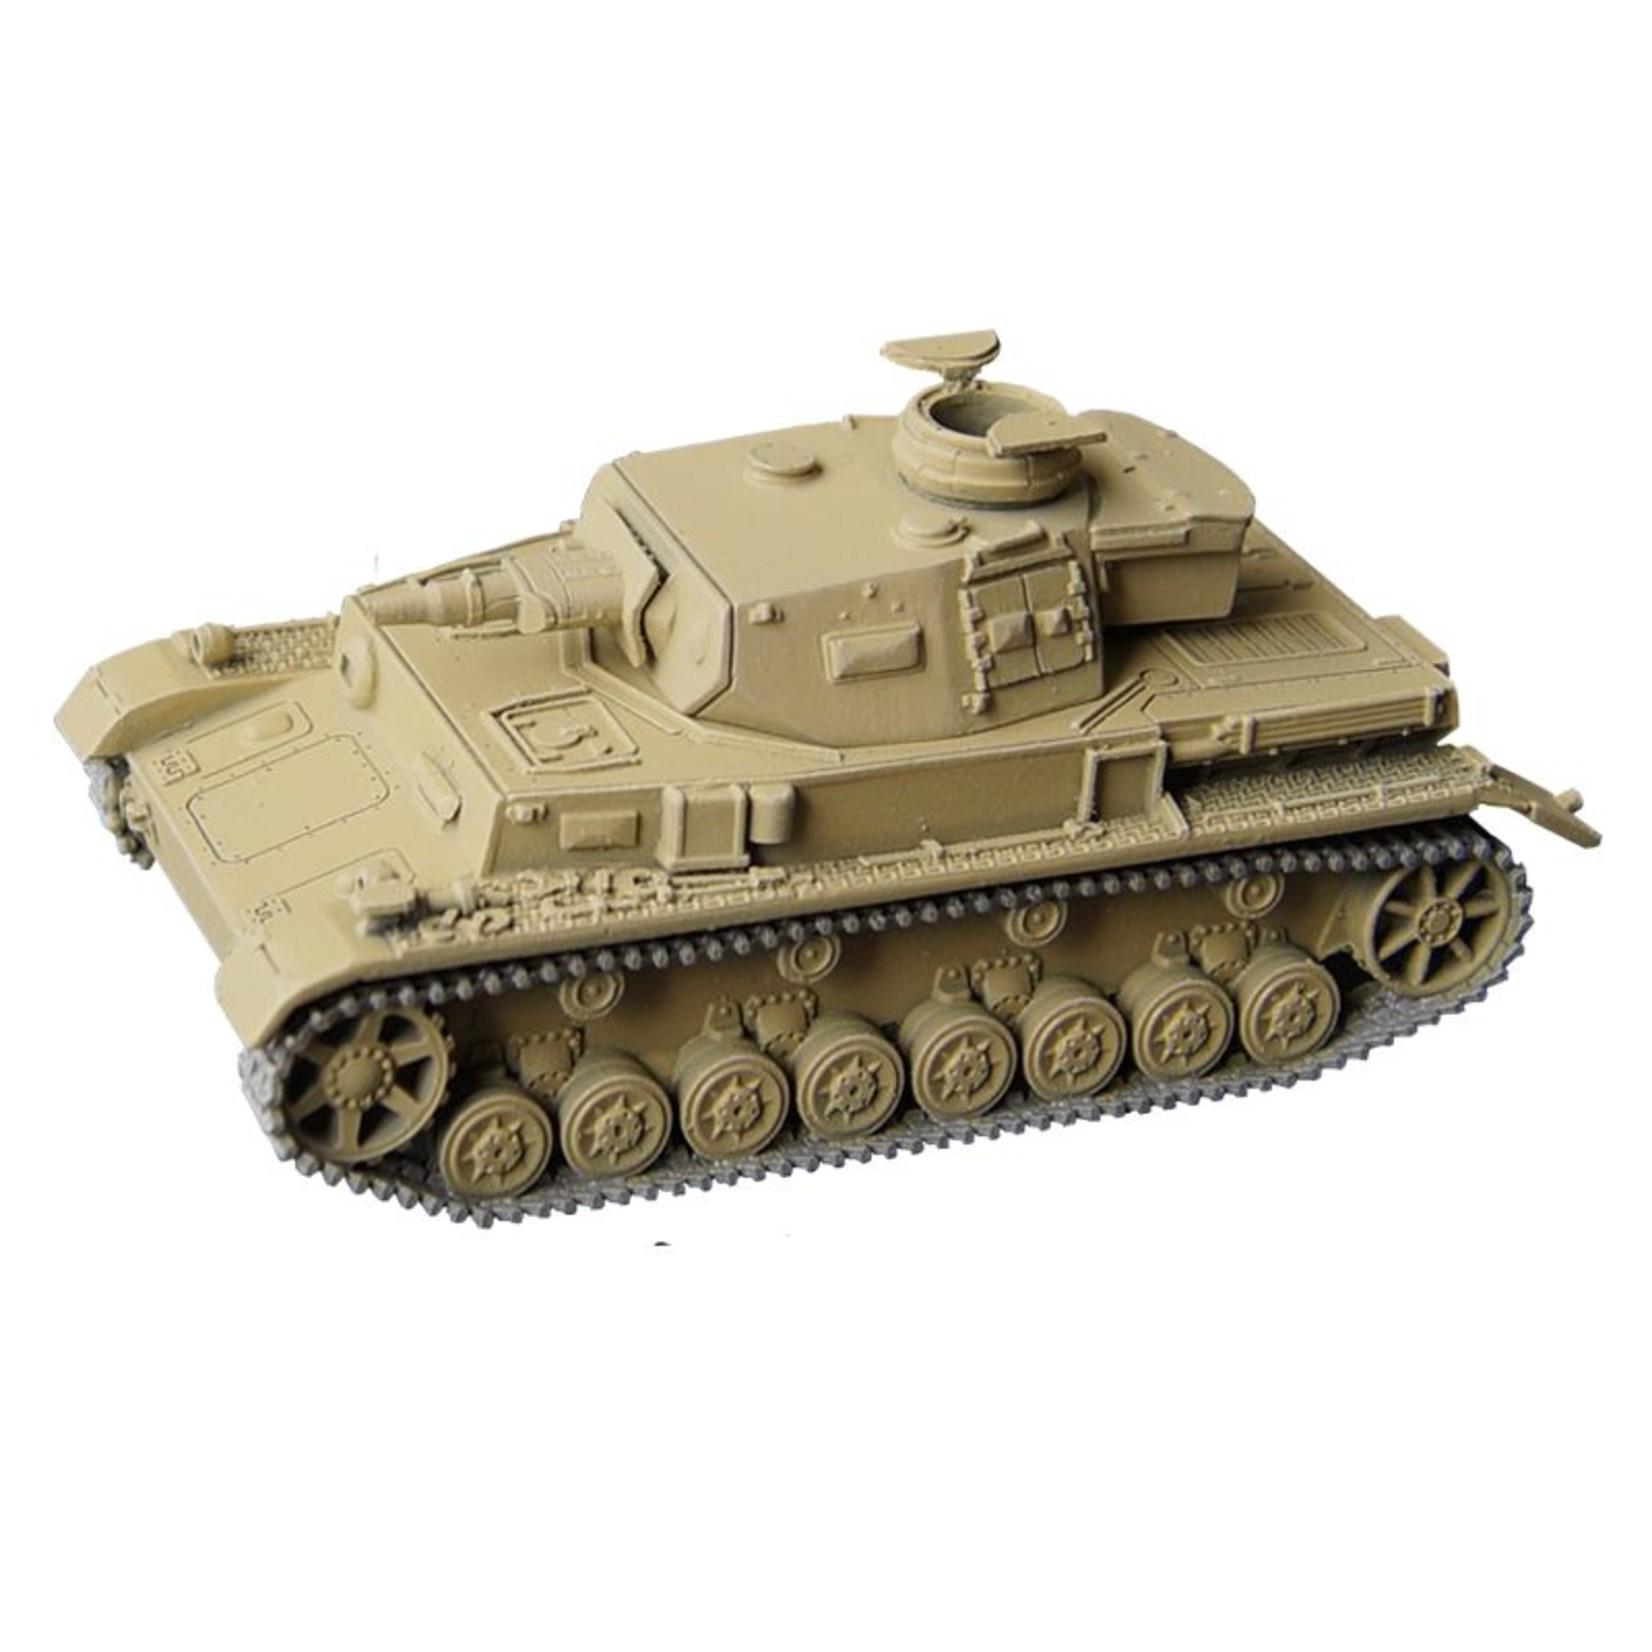 Panzer IV Ausf. F1